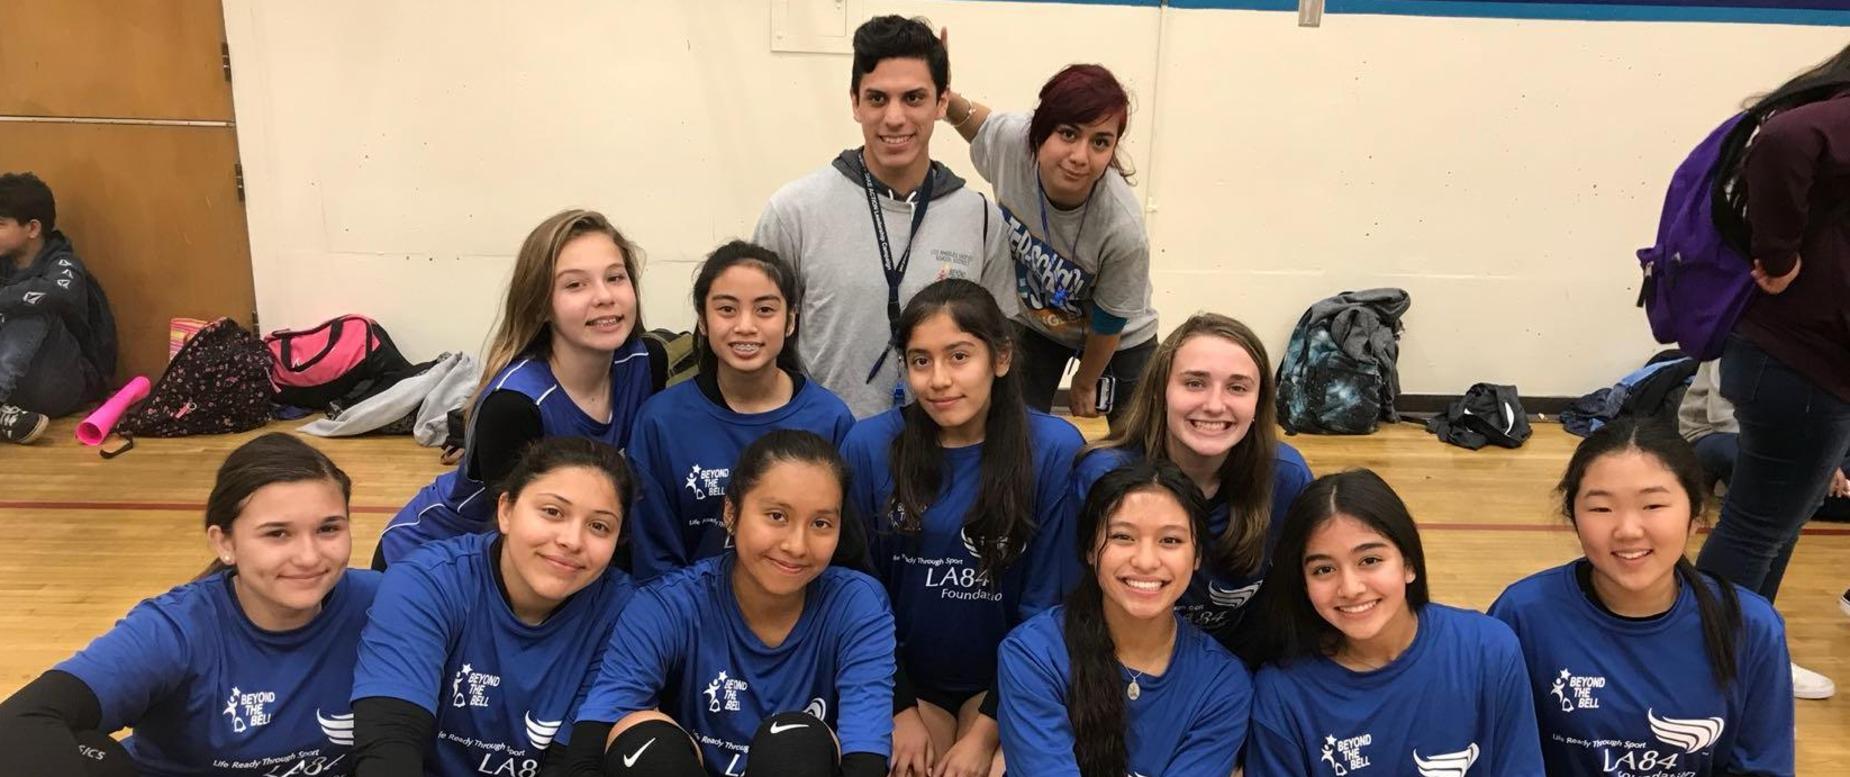 Mt Gleason VolleyBall District Champions